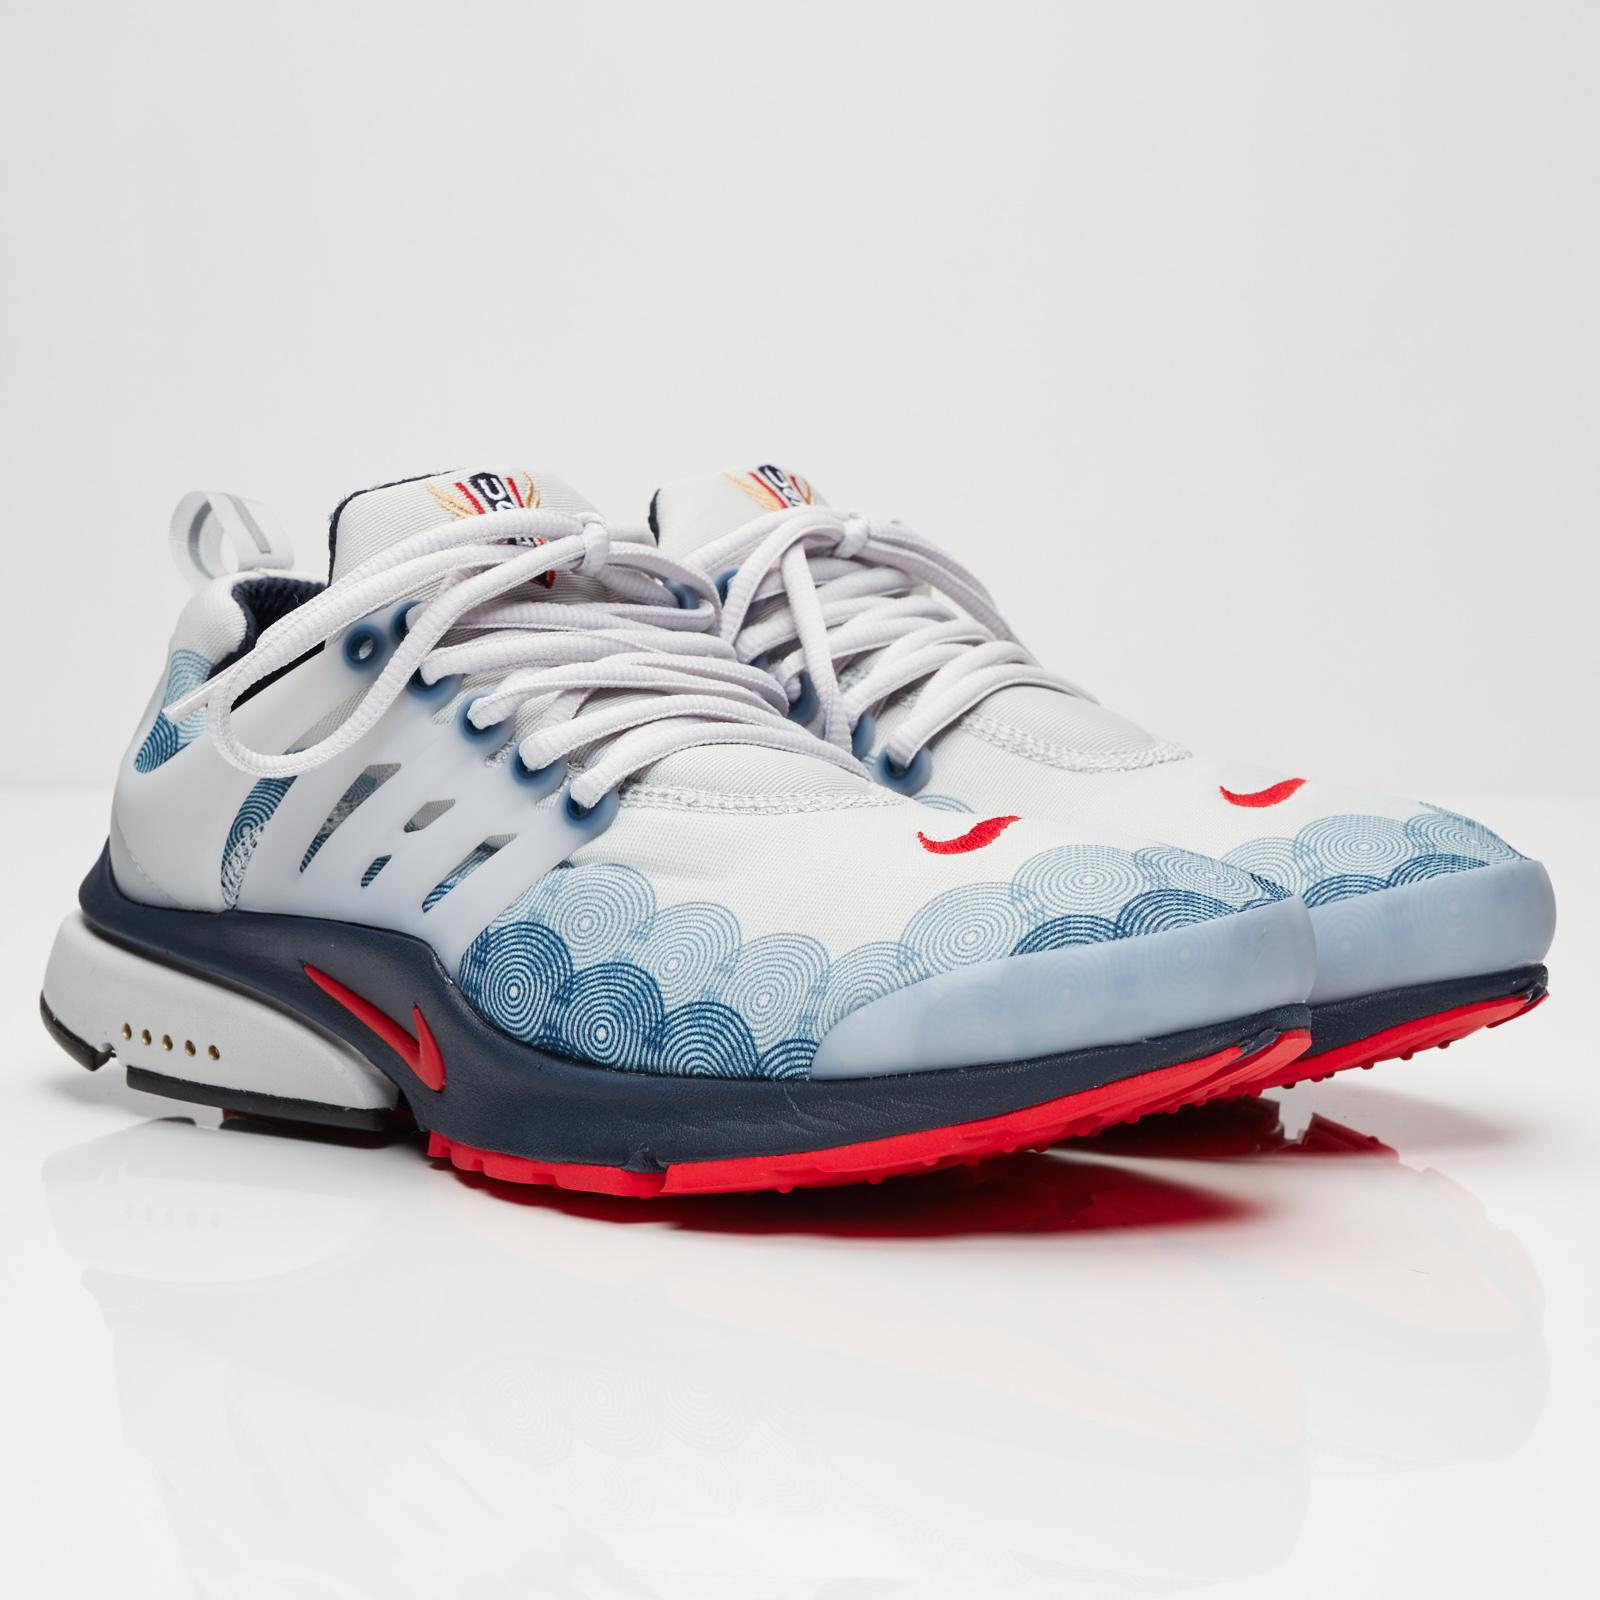 Amplia gama Despertar Nos vemos  Nike Air Presto GPX - 848188-004 - Sneakersnstuff | sneakers & streetwear  online since 1999